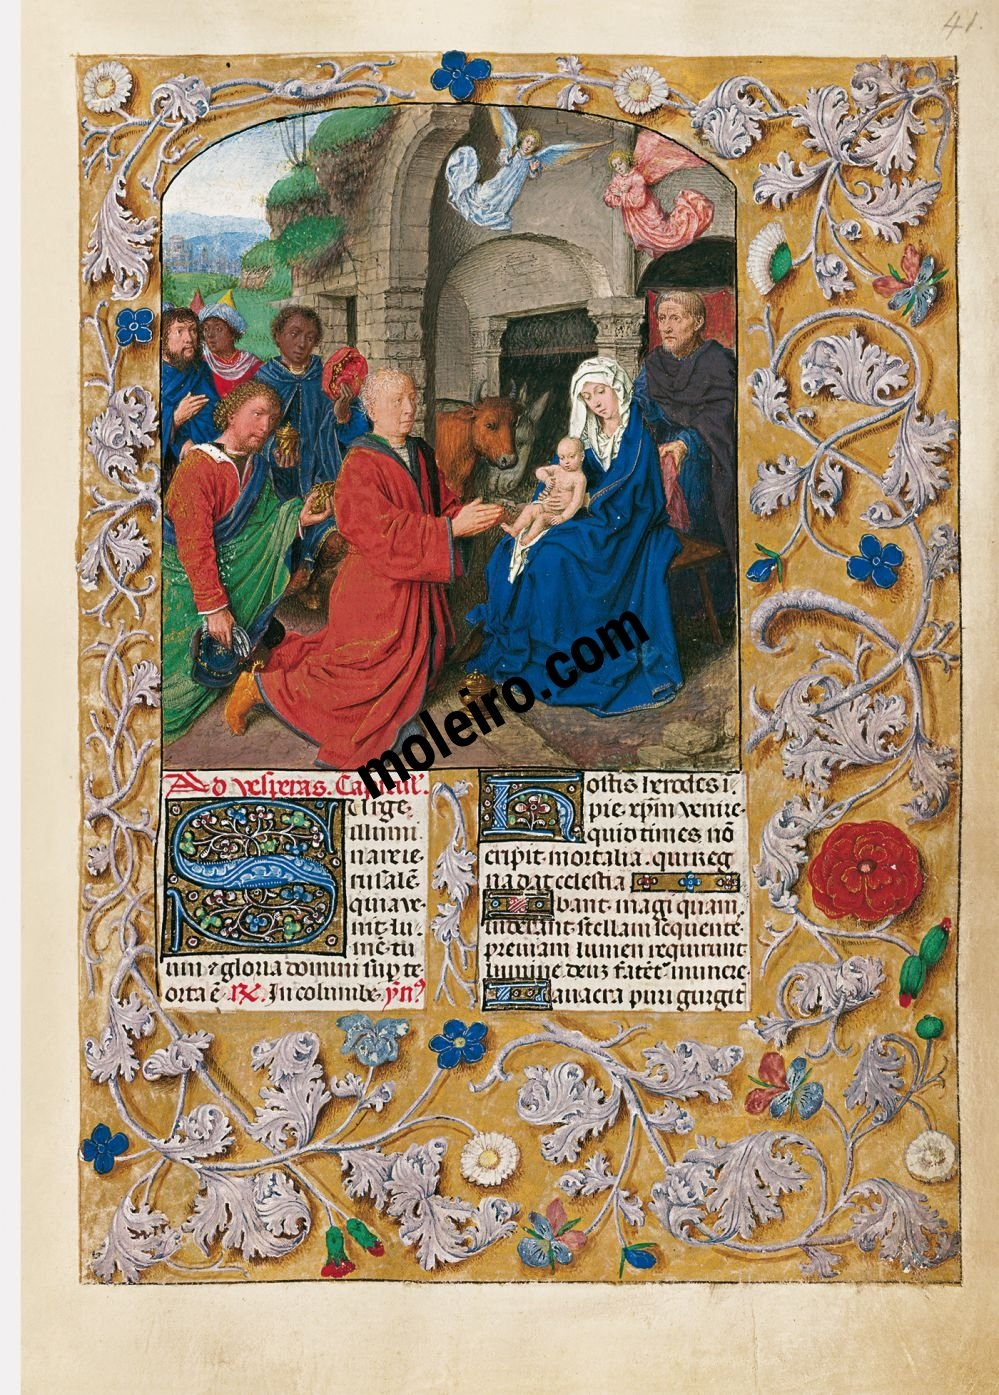 The Isabella Breviary f. 41r, Adoration of the Magi